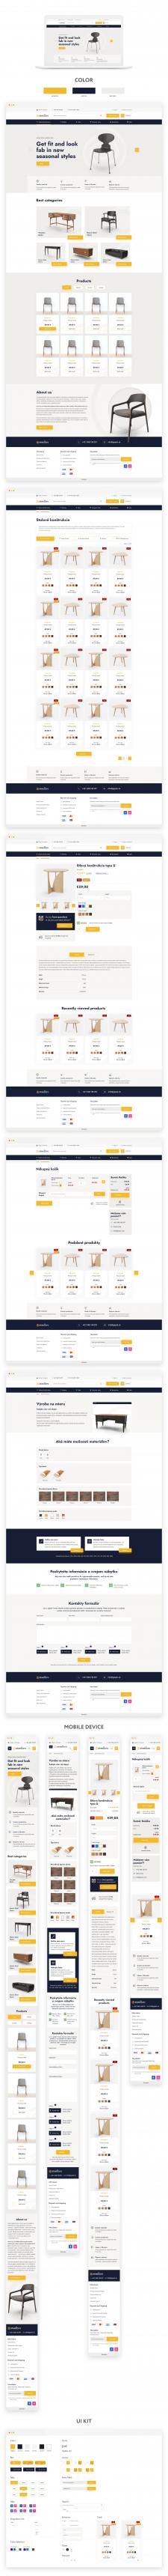 Steelbro - интернет-магазин продажа мебели